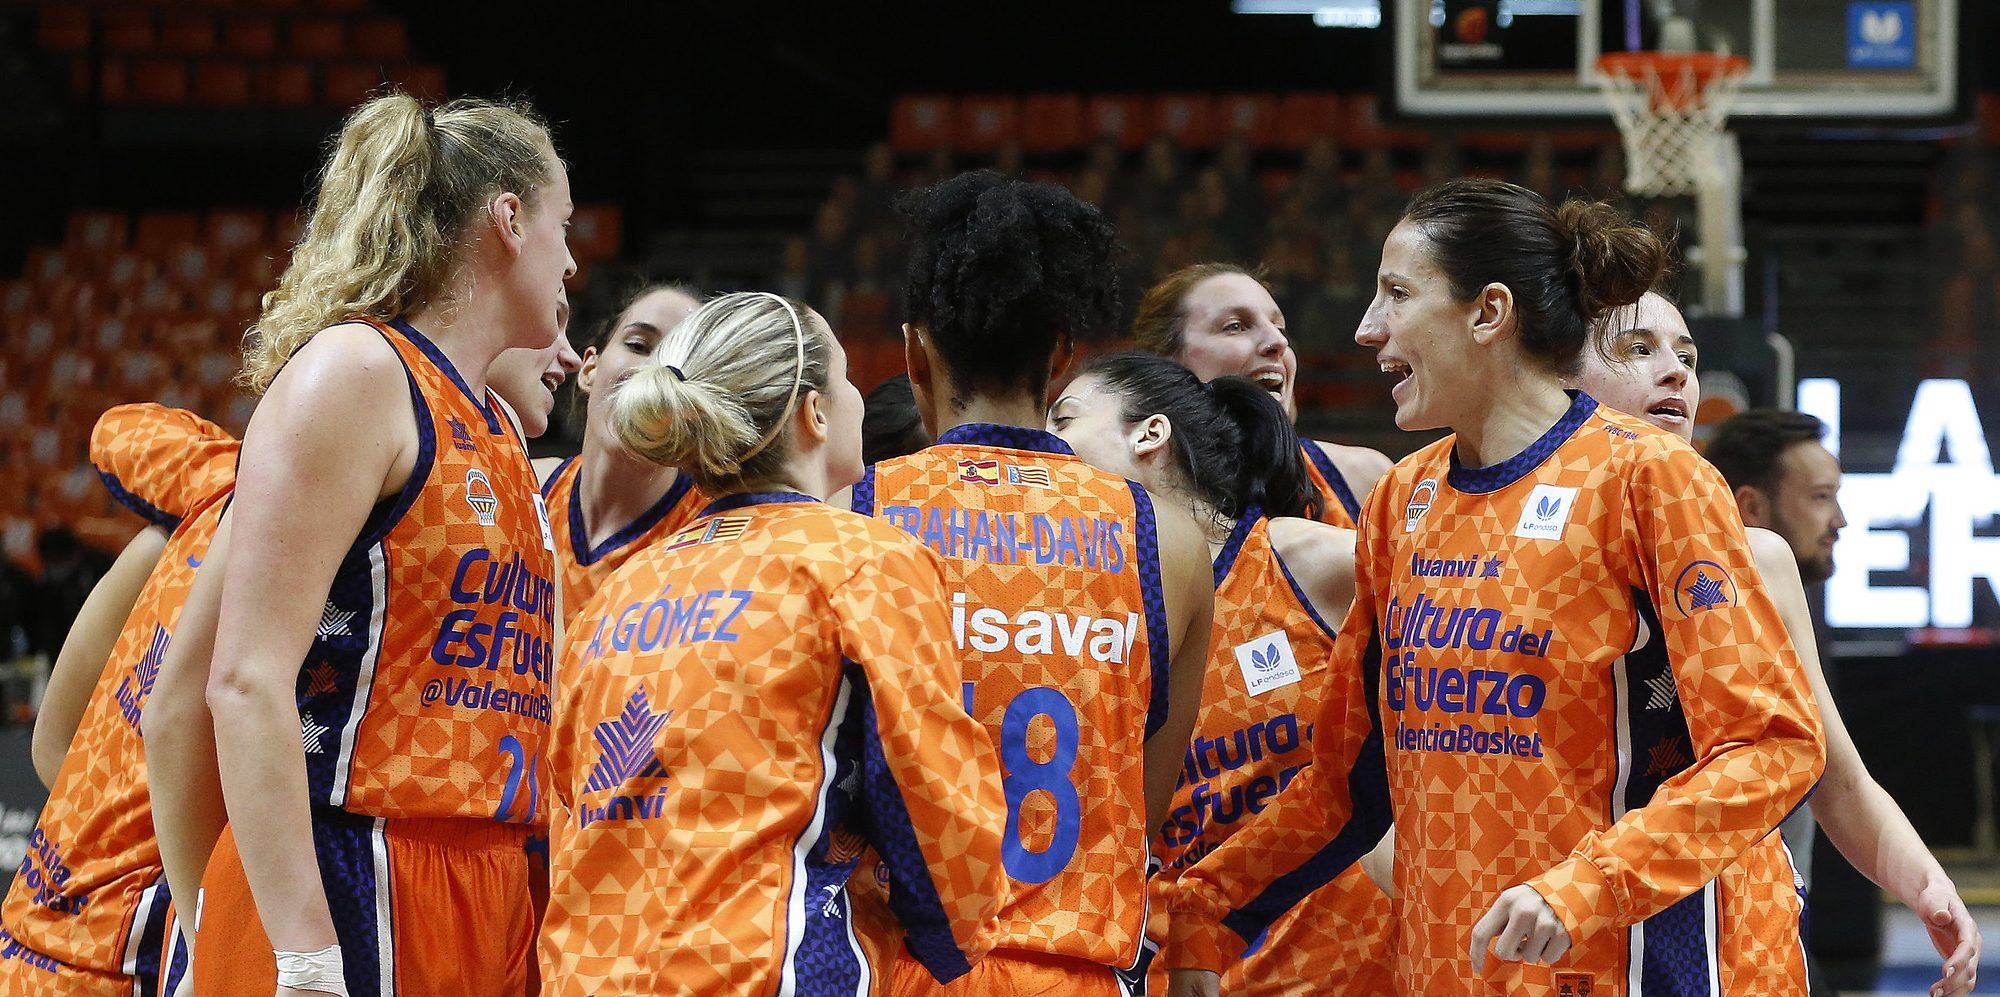 Valencia Basket está recuperando sensaciones